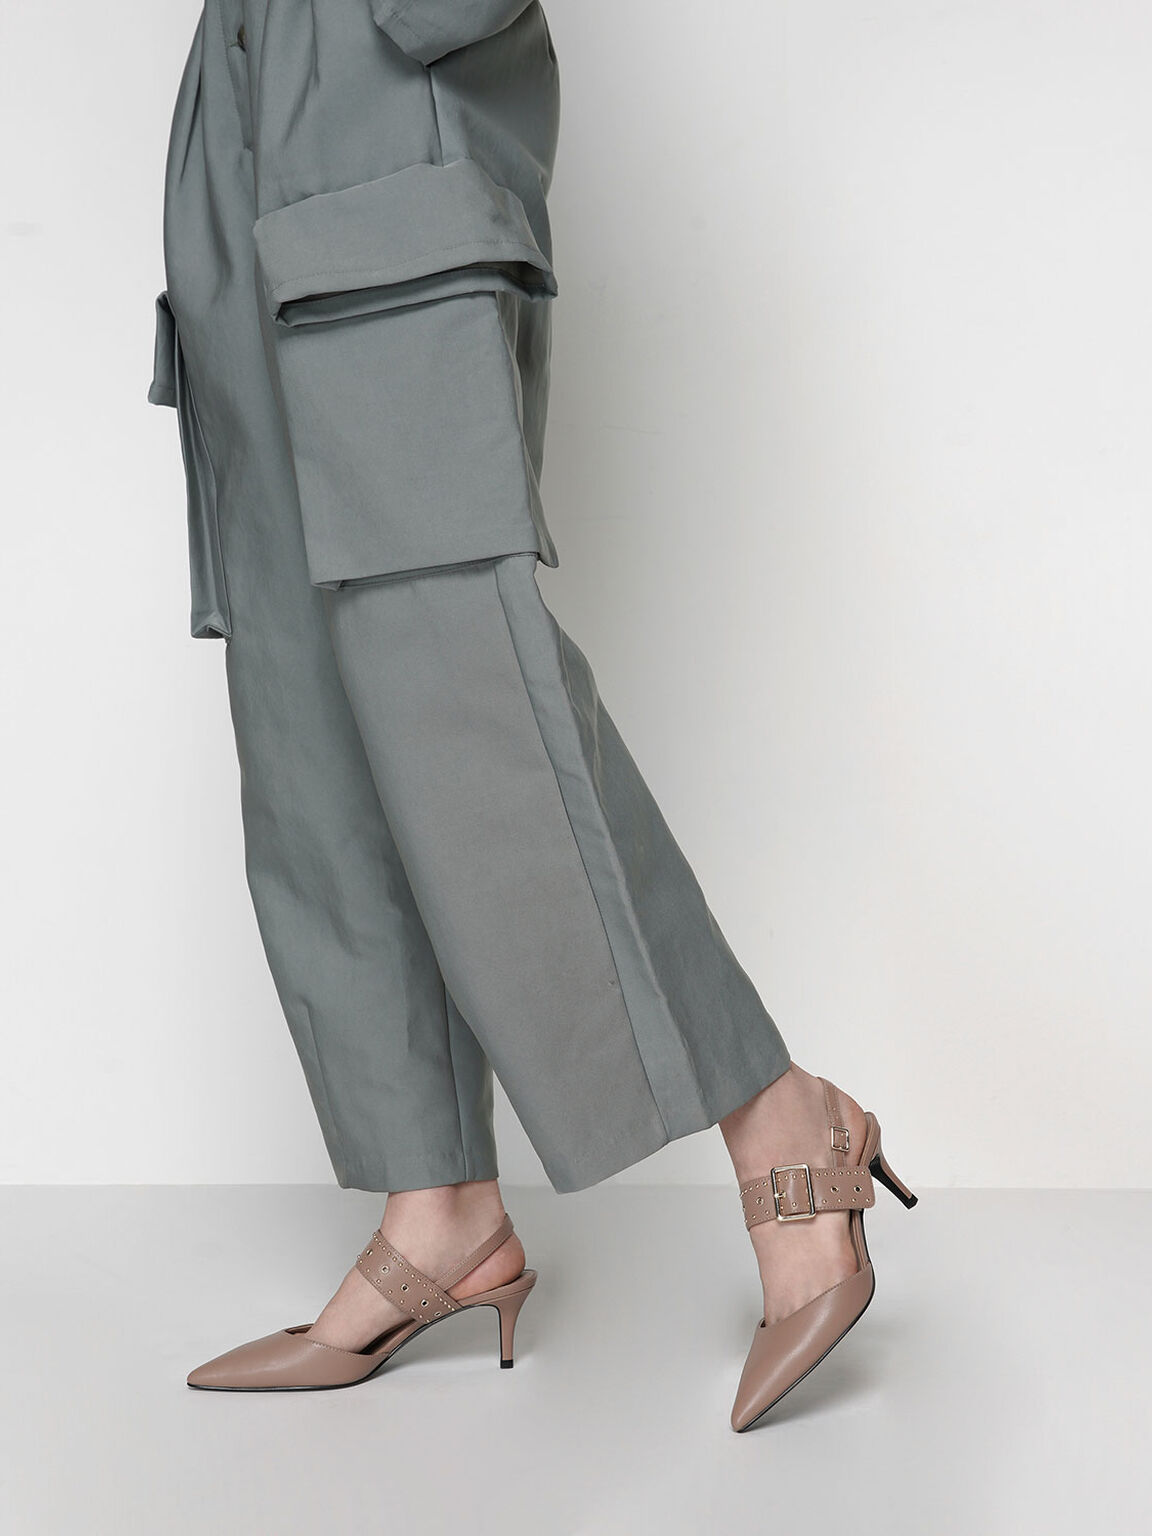 Studded Slingback Heels, Nude, hi-res